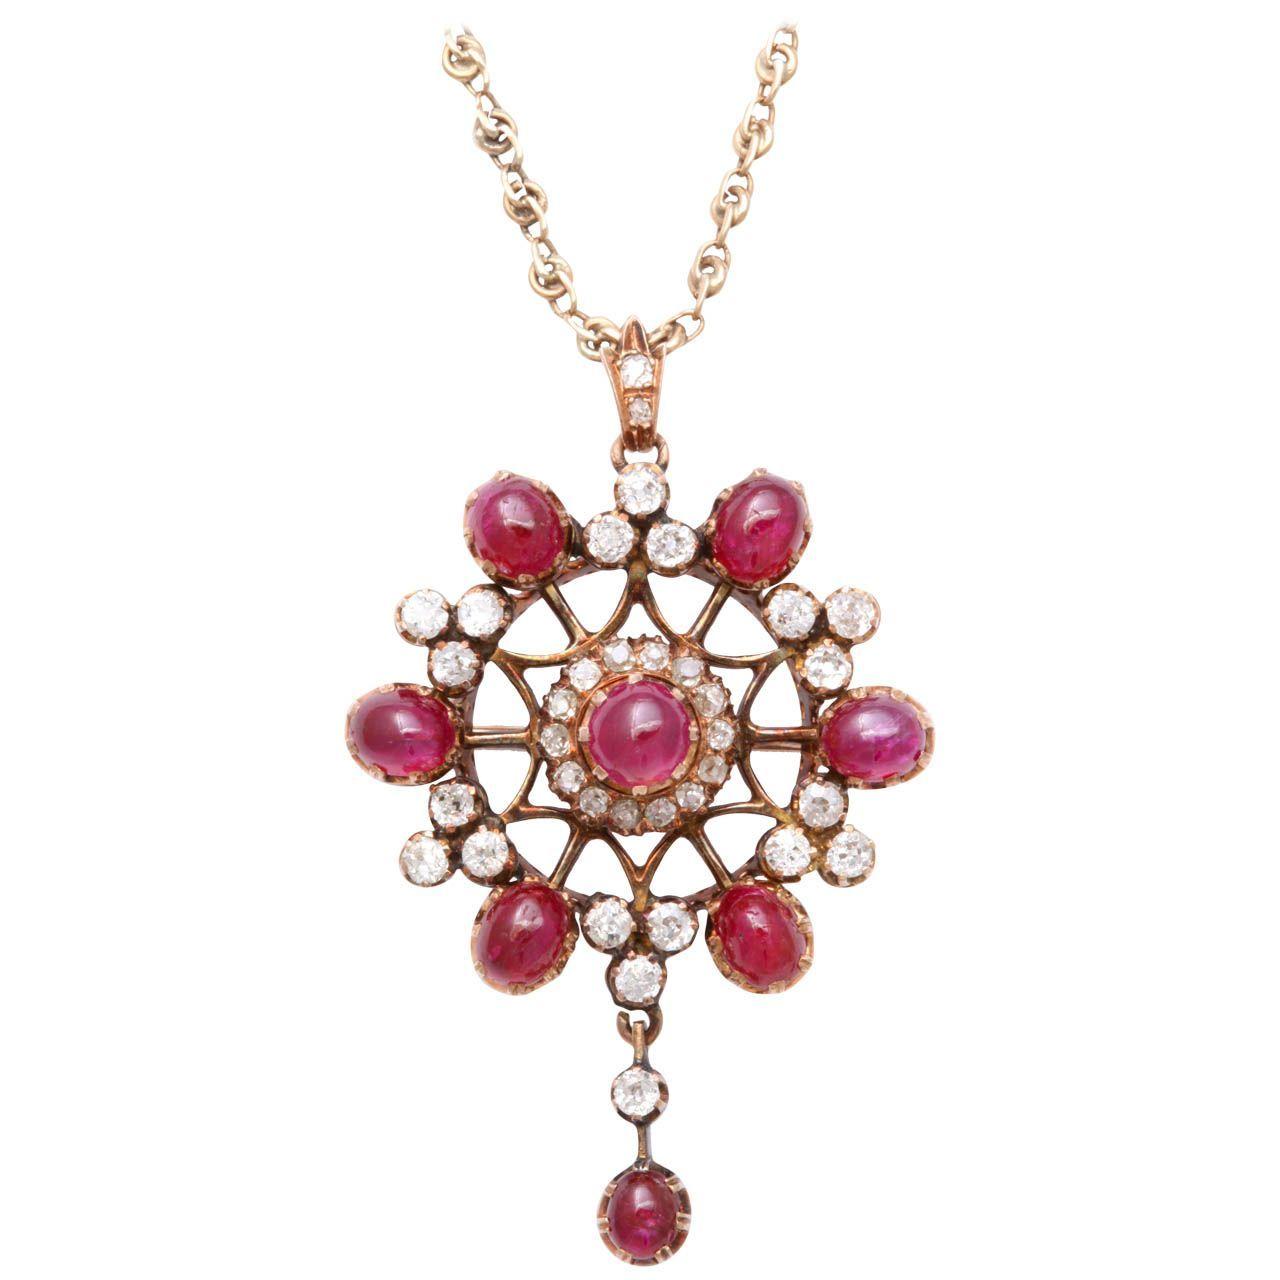 Victorian cabochon ruby u old mine diamond pendant brooch set in